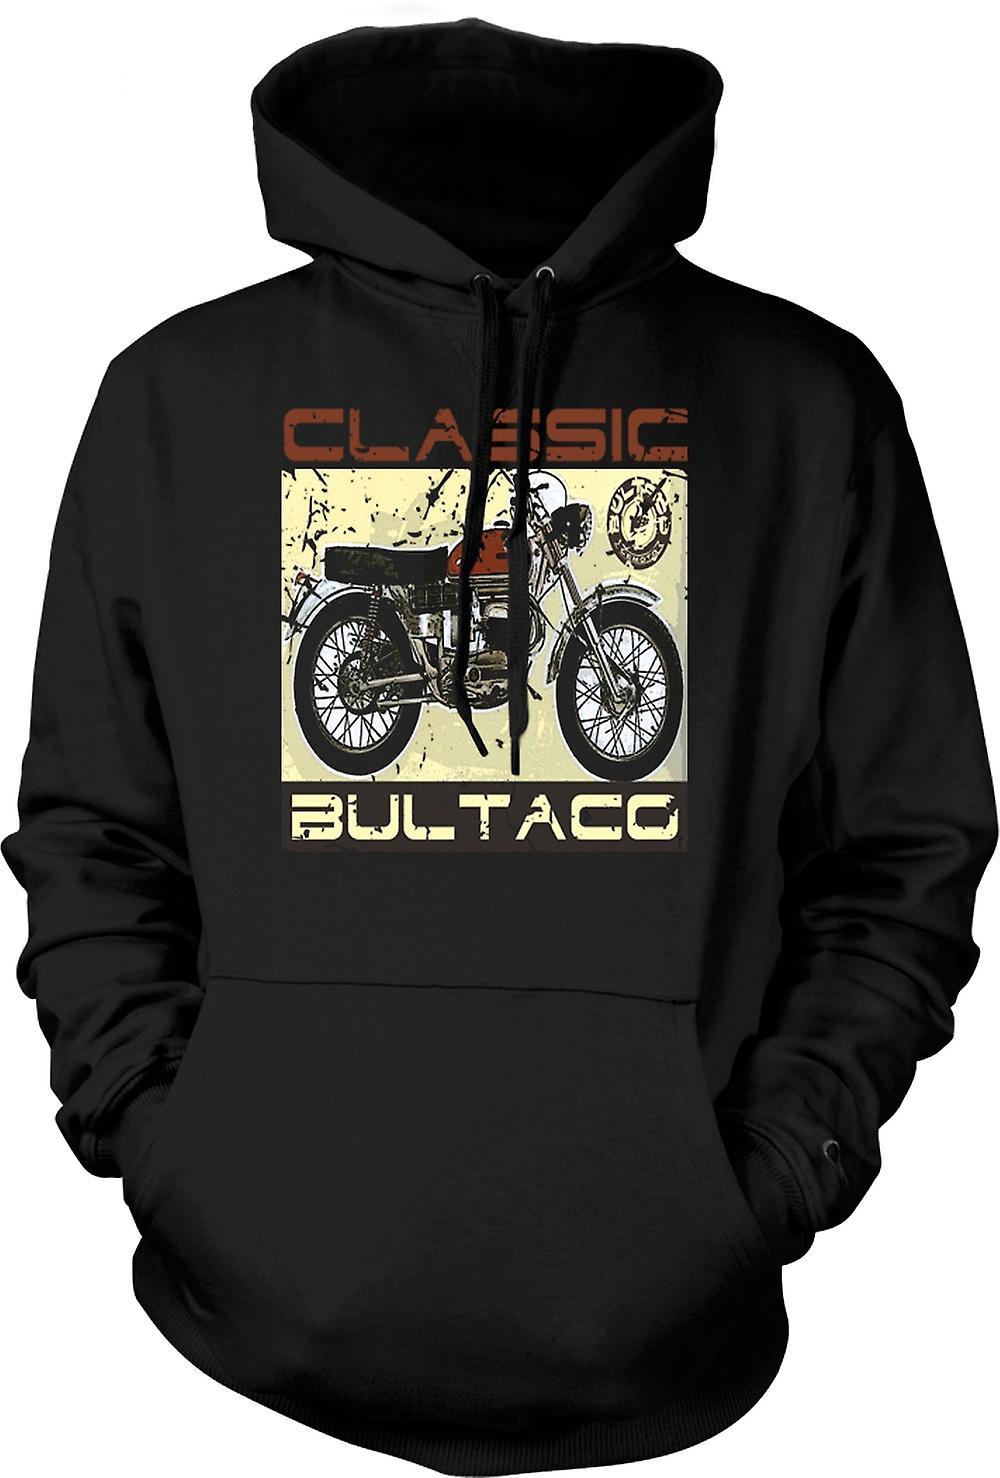 Kids Hoodie - Bultaco Classic Dirt Bike